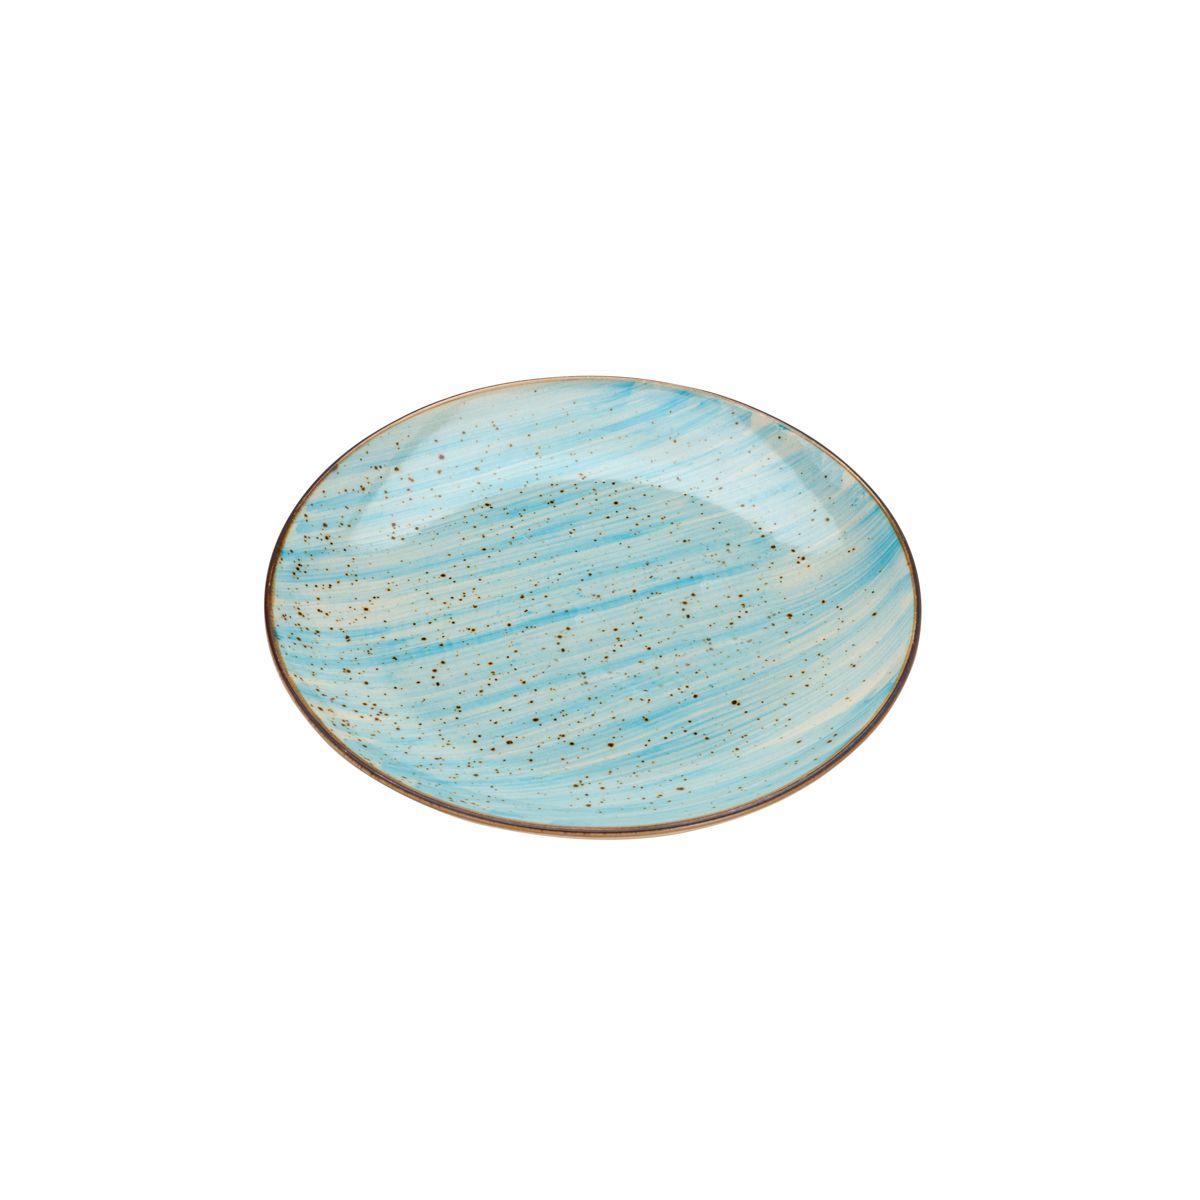 Jogo 4 pratos 19 cm para sobremesa de porcelana rosa e azul Watercolor Bon Gourmet - C26491